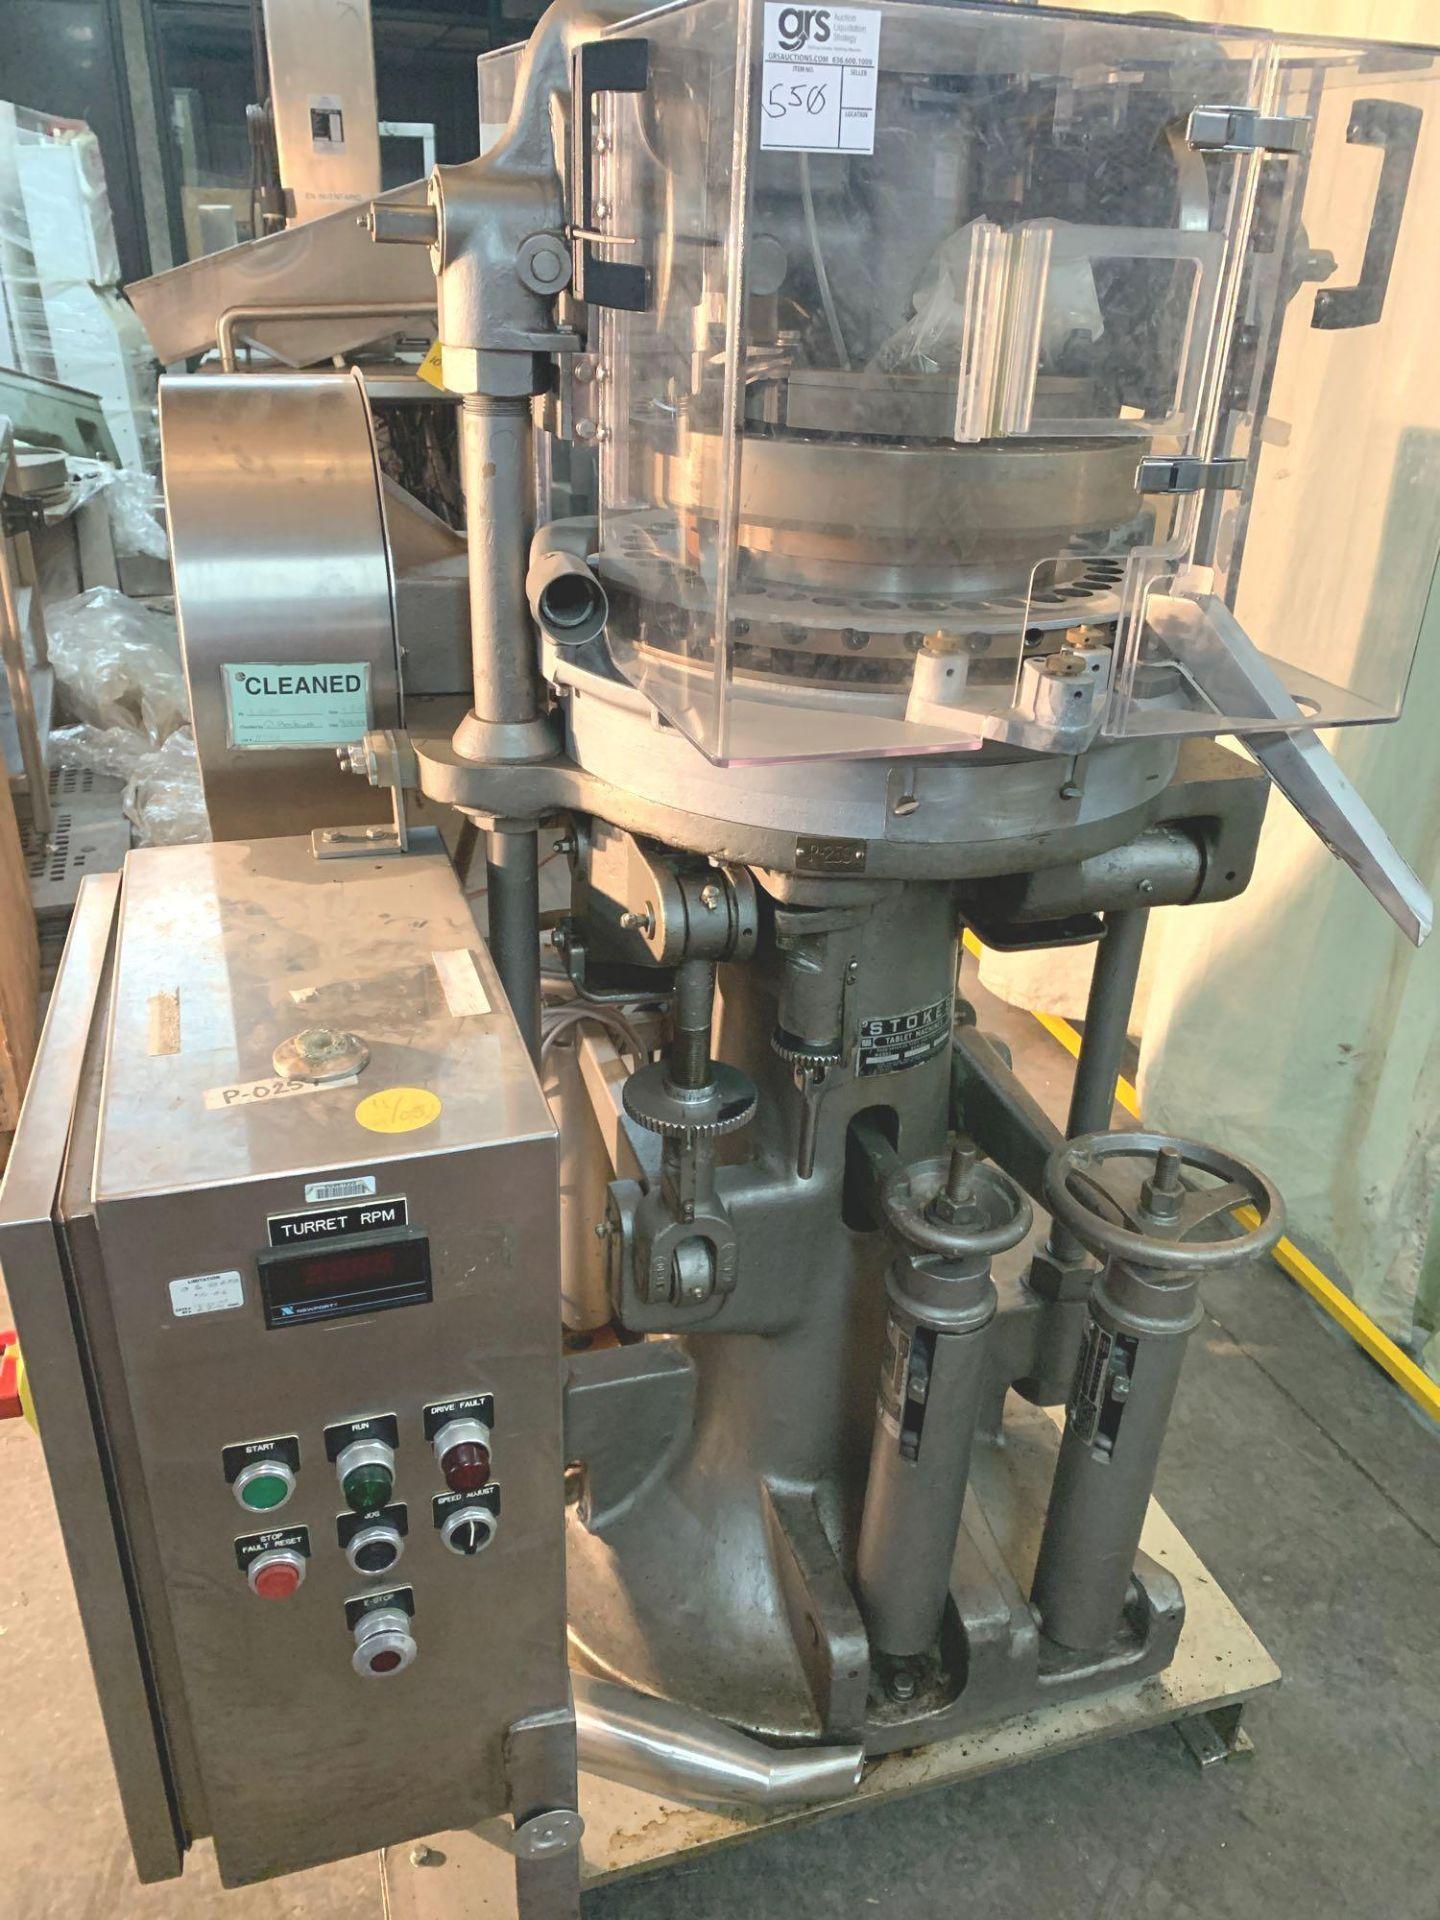 Stokes 580-1, 35 Station Tablet Press